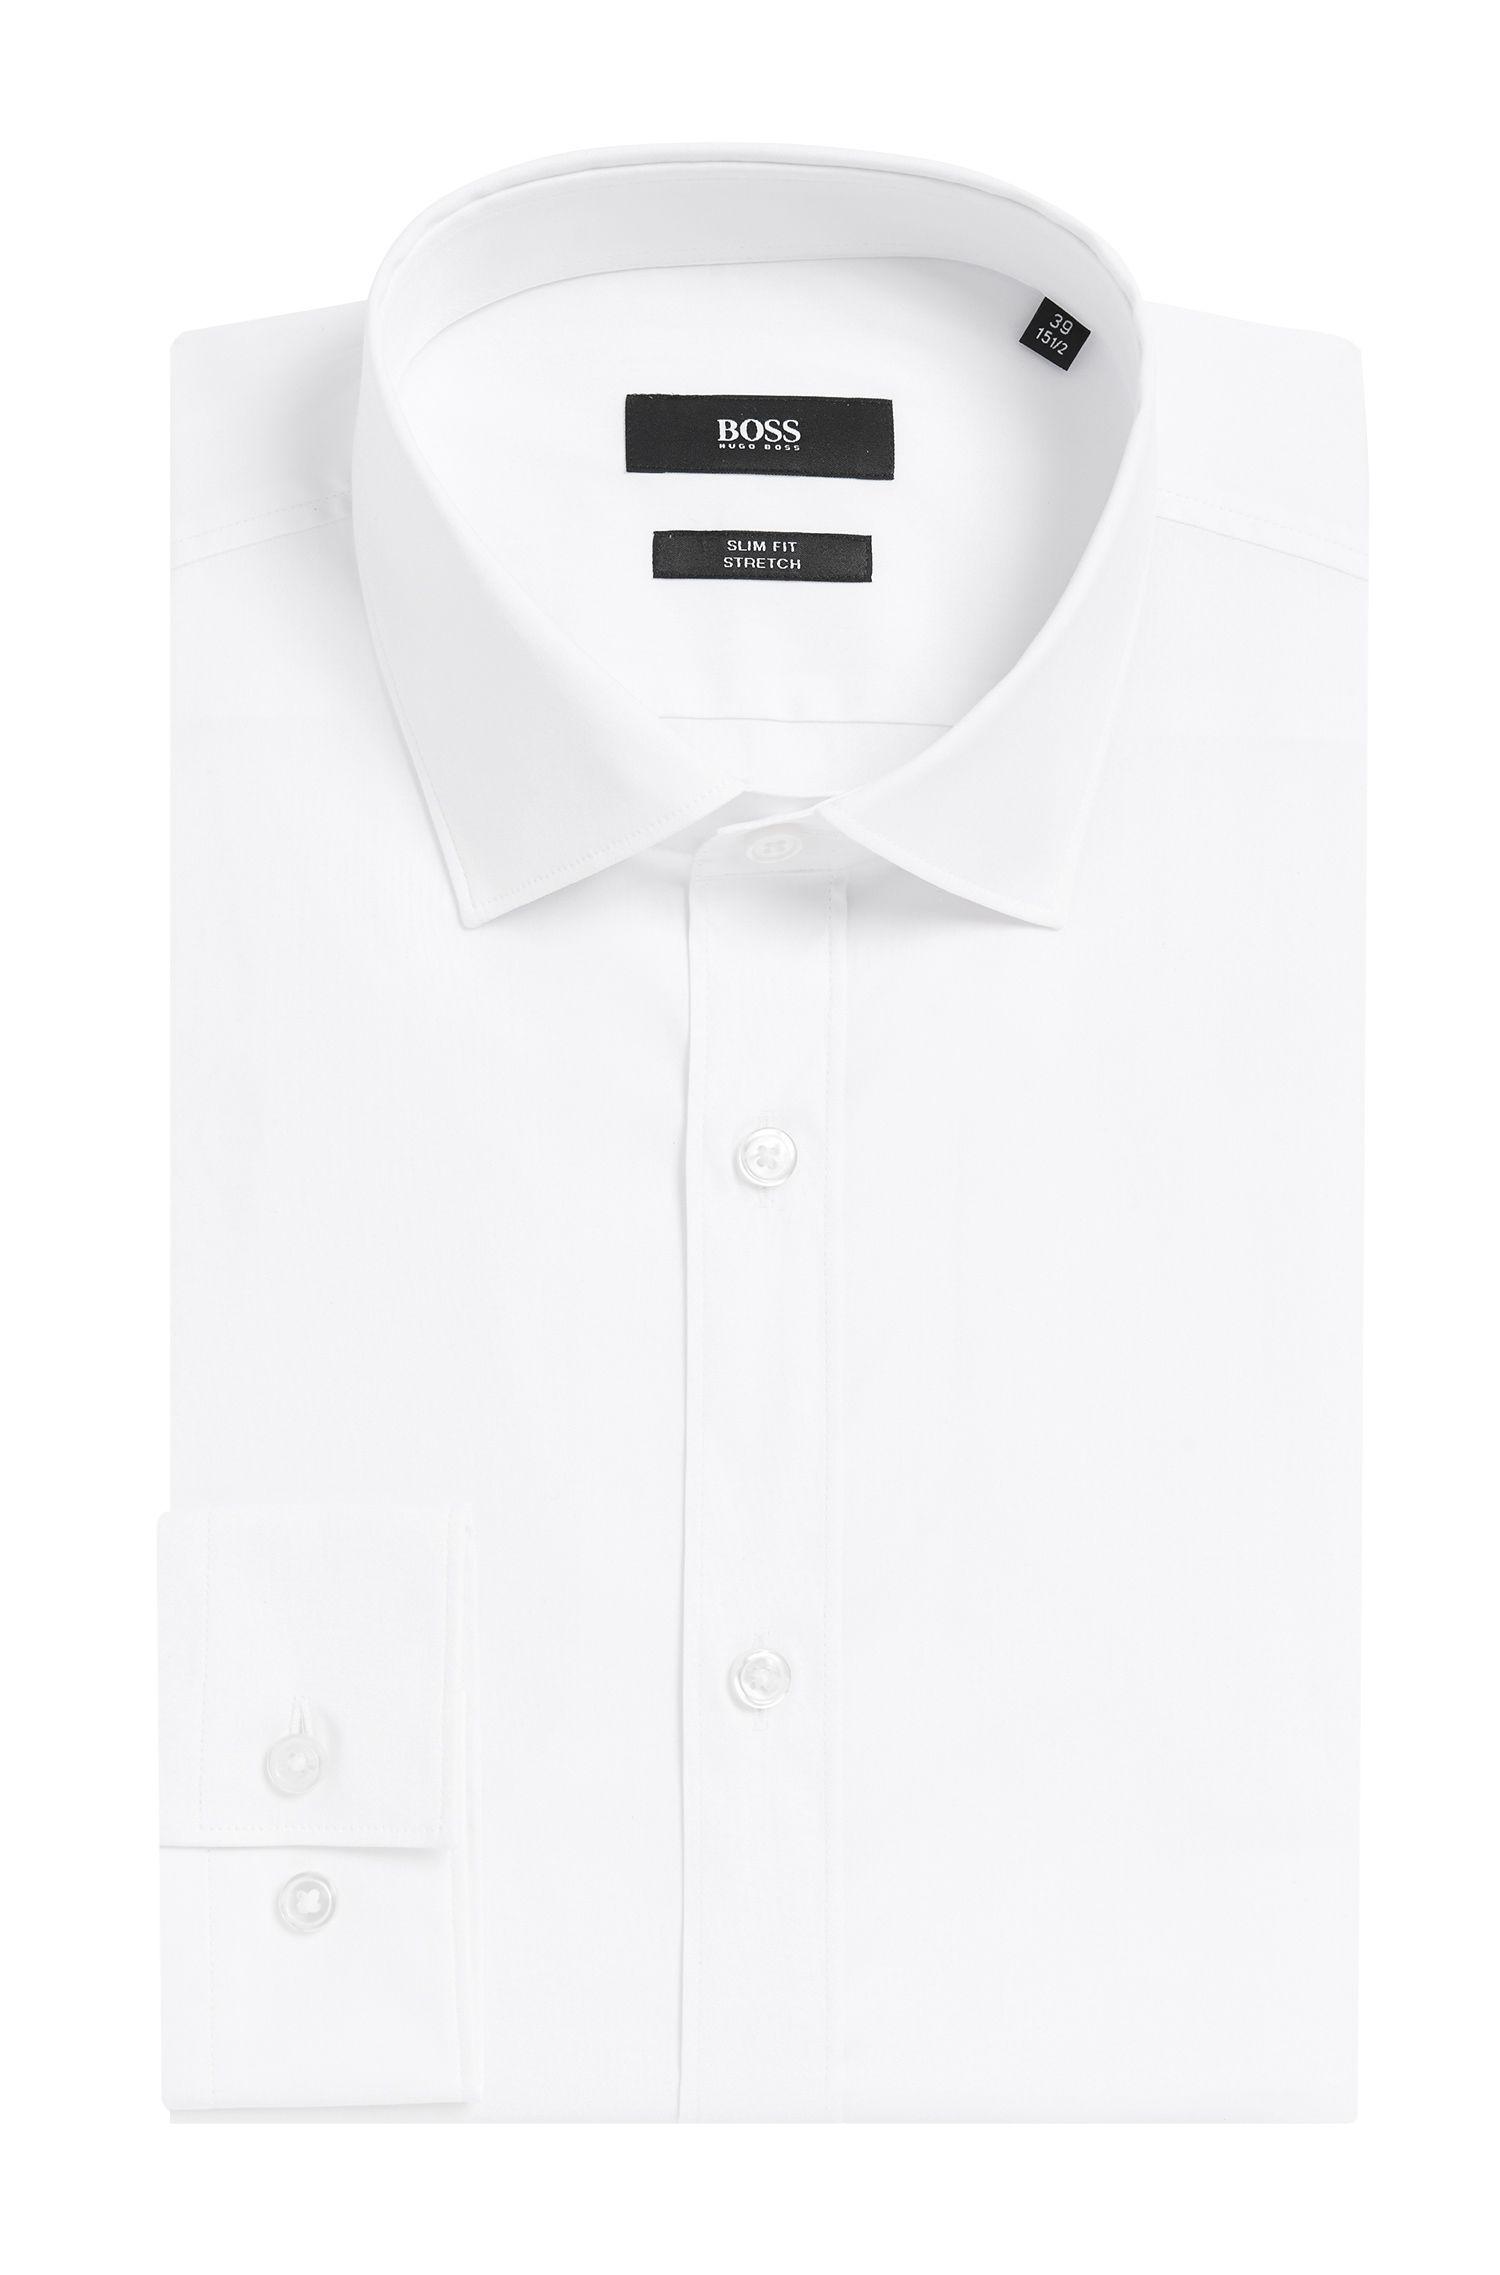 'Isaak' | Slim Fit, Stretch Cotton Blend Dress Shirt